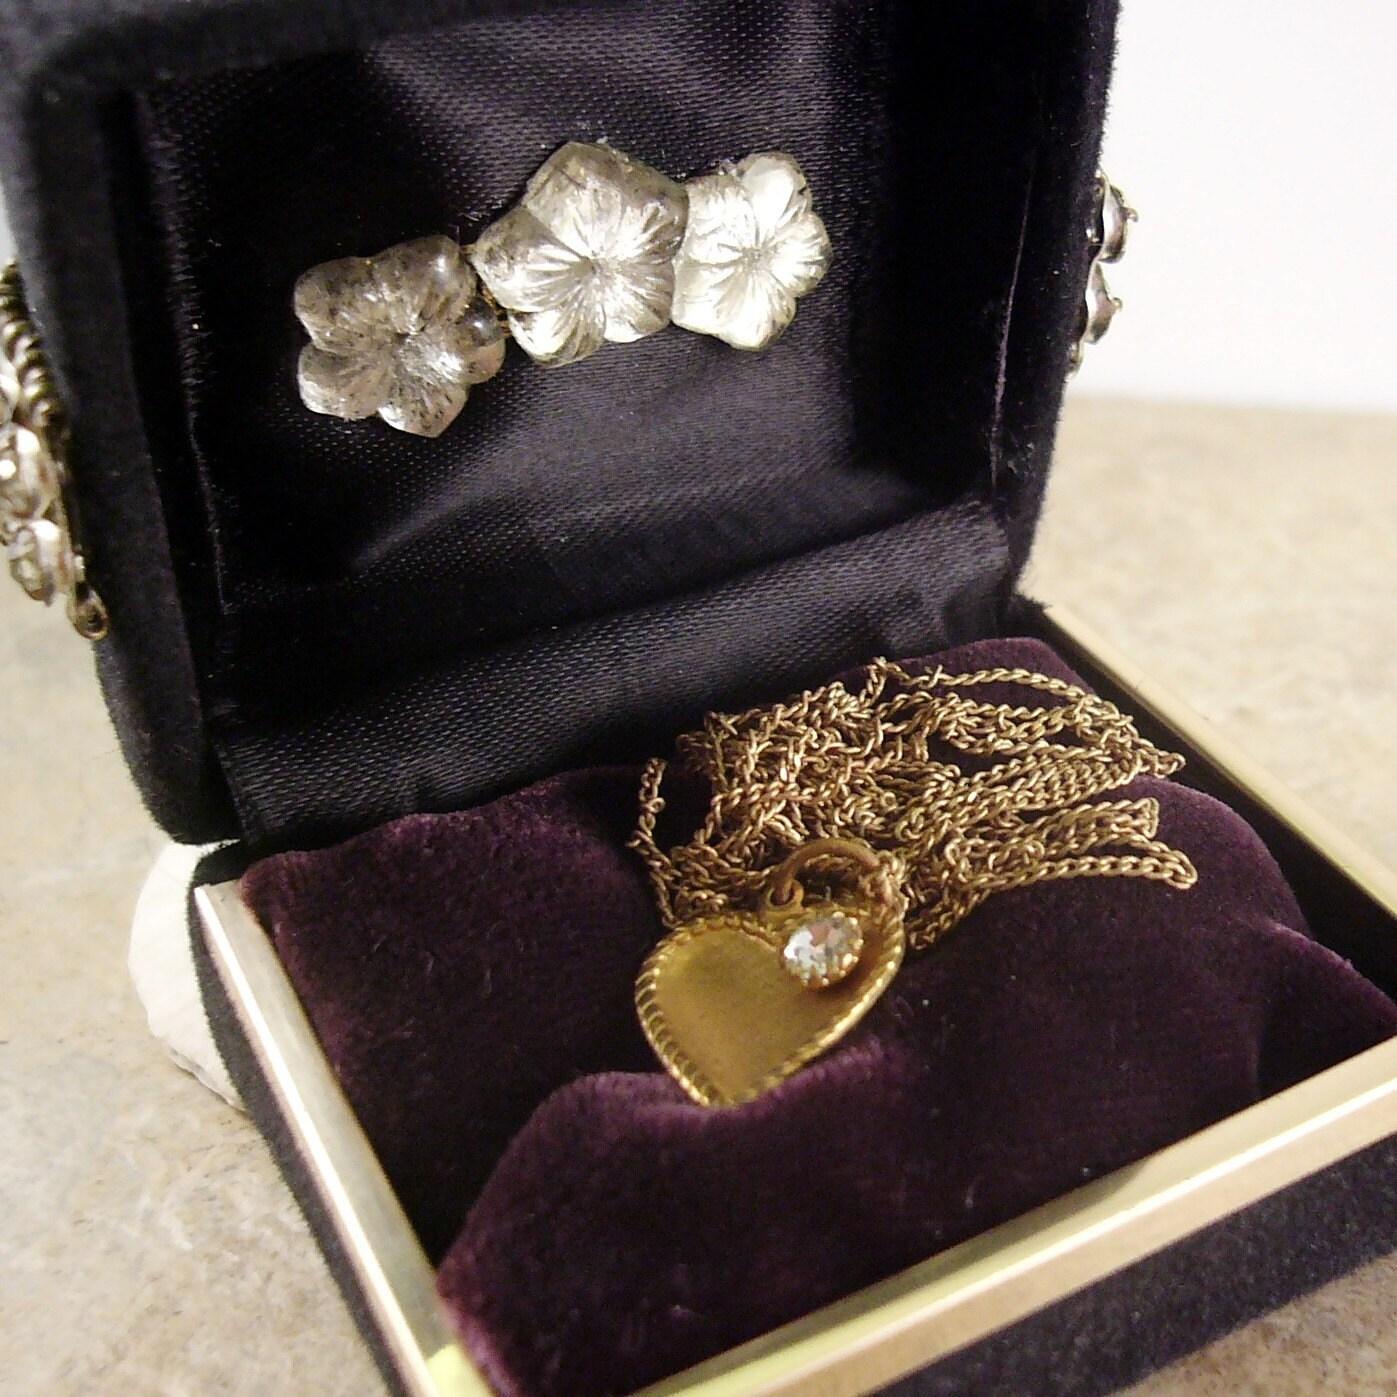 Rhinestone Pheasant Bird Jewelry Treasure Box- Altered Art Assemblage One of a Kind